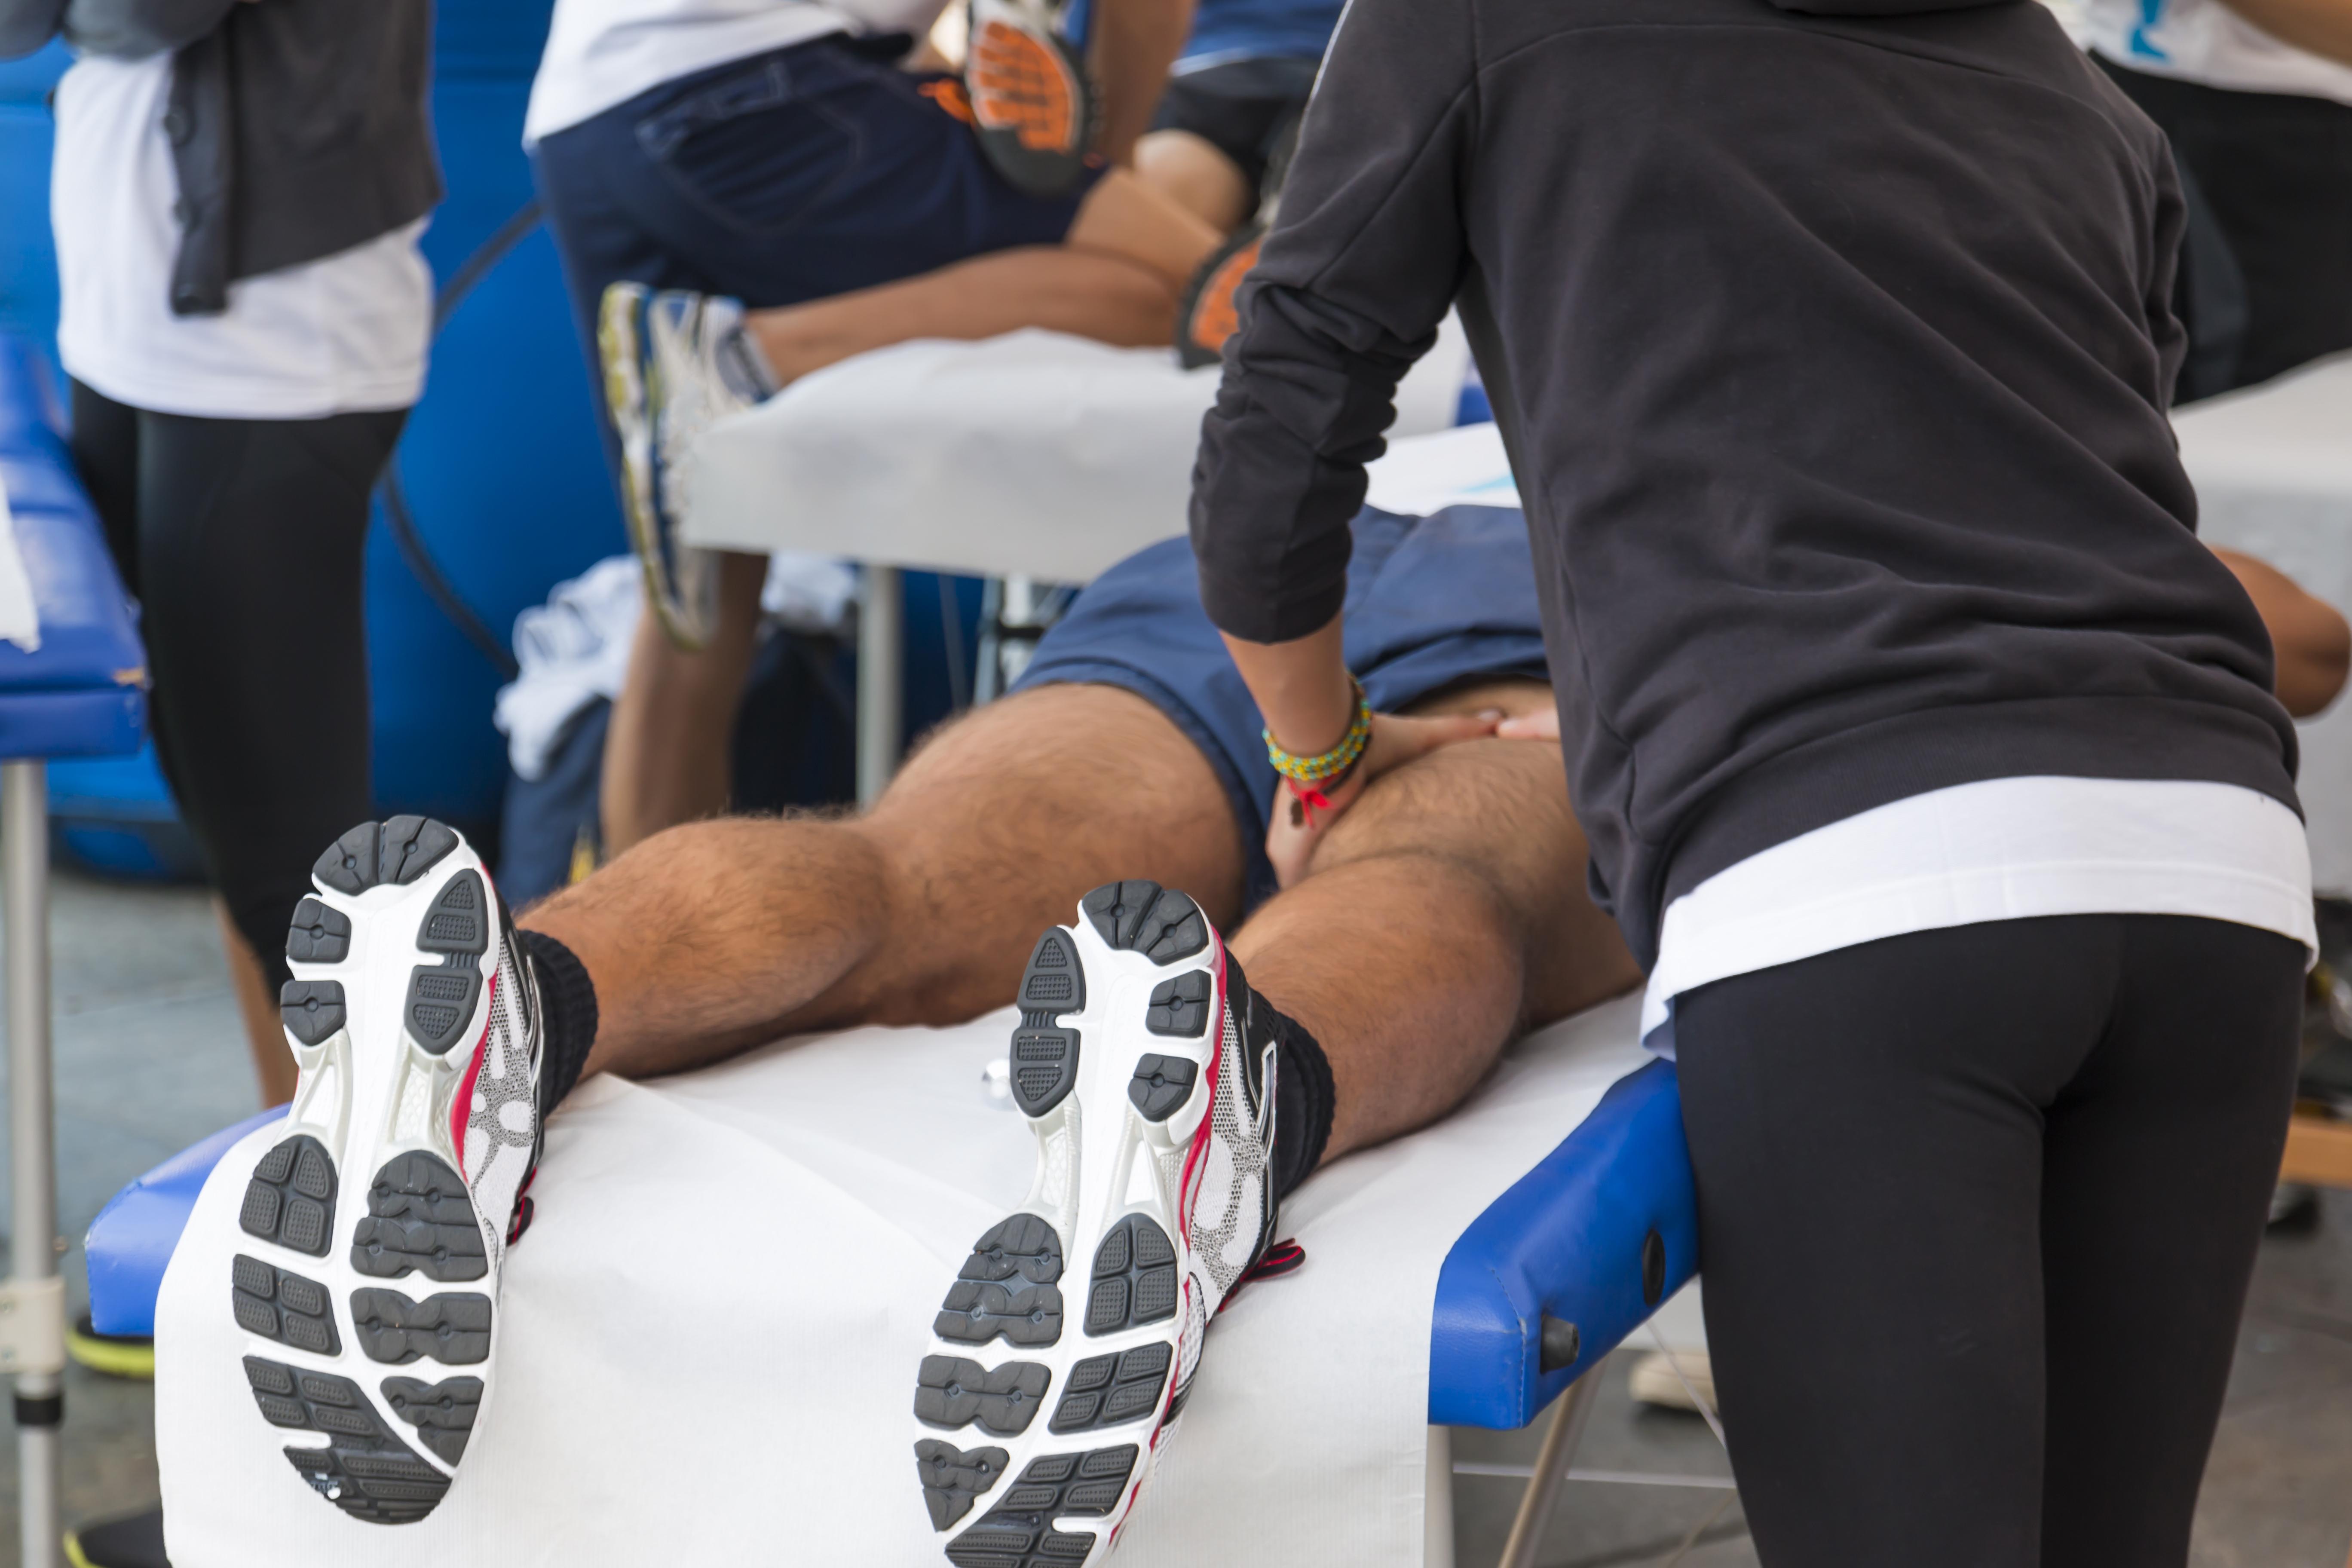 athletes relaxation massage before sport event, marathon muscles massage